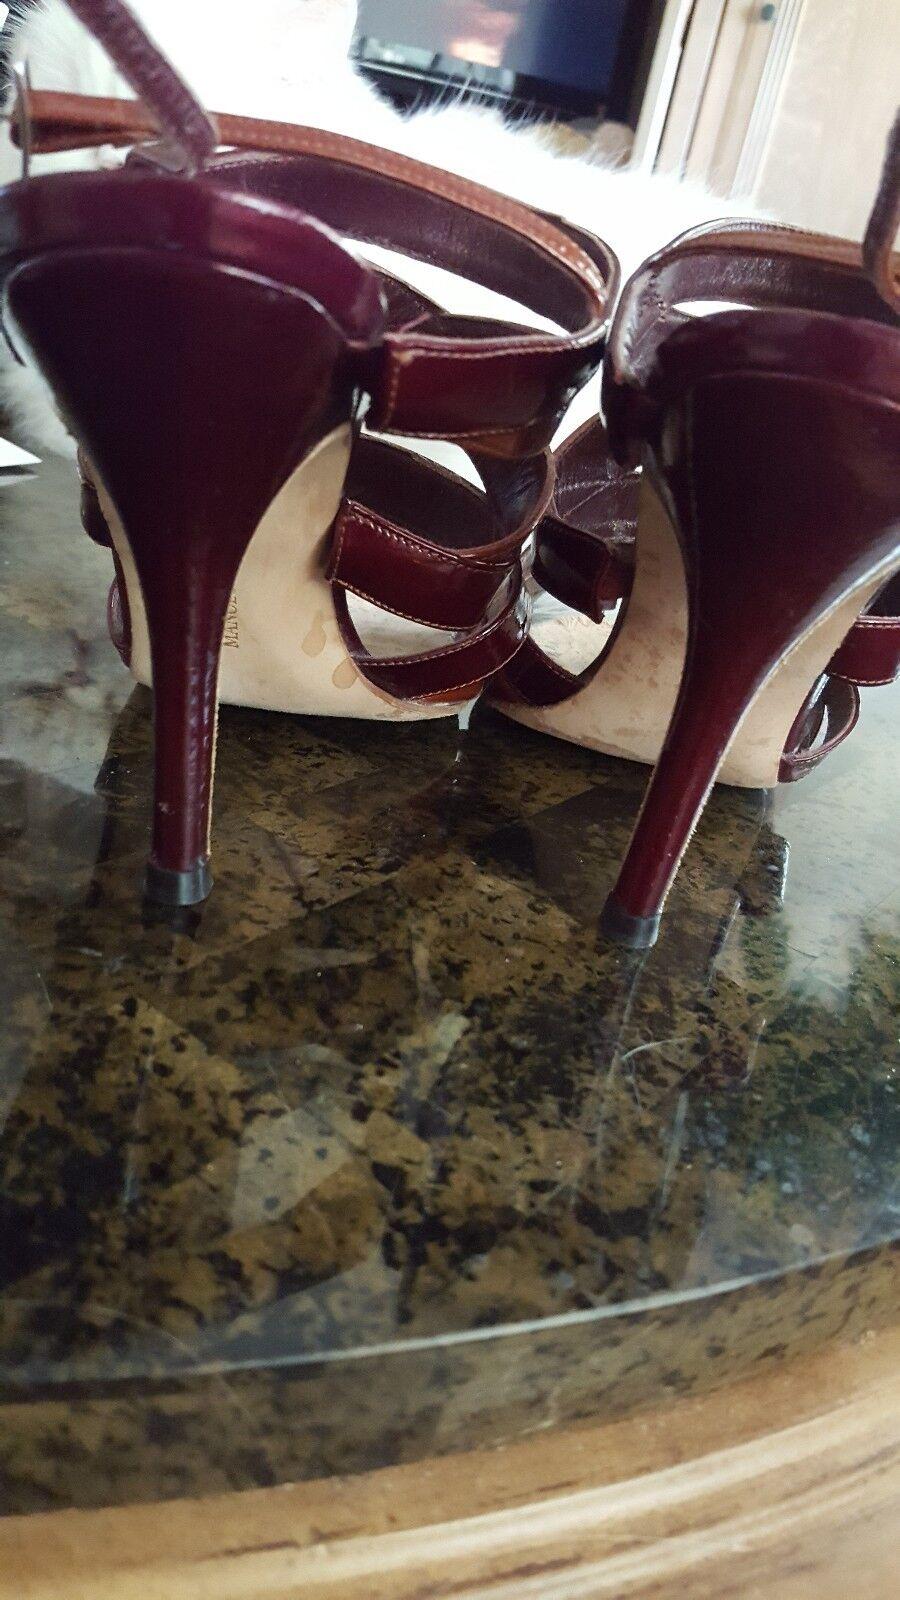 Manolo Blahnik Strappy Sandals Sandals Sandals 38.5 8.5 b9a0ad